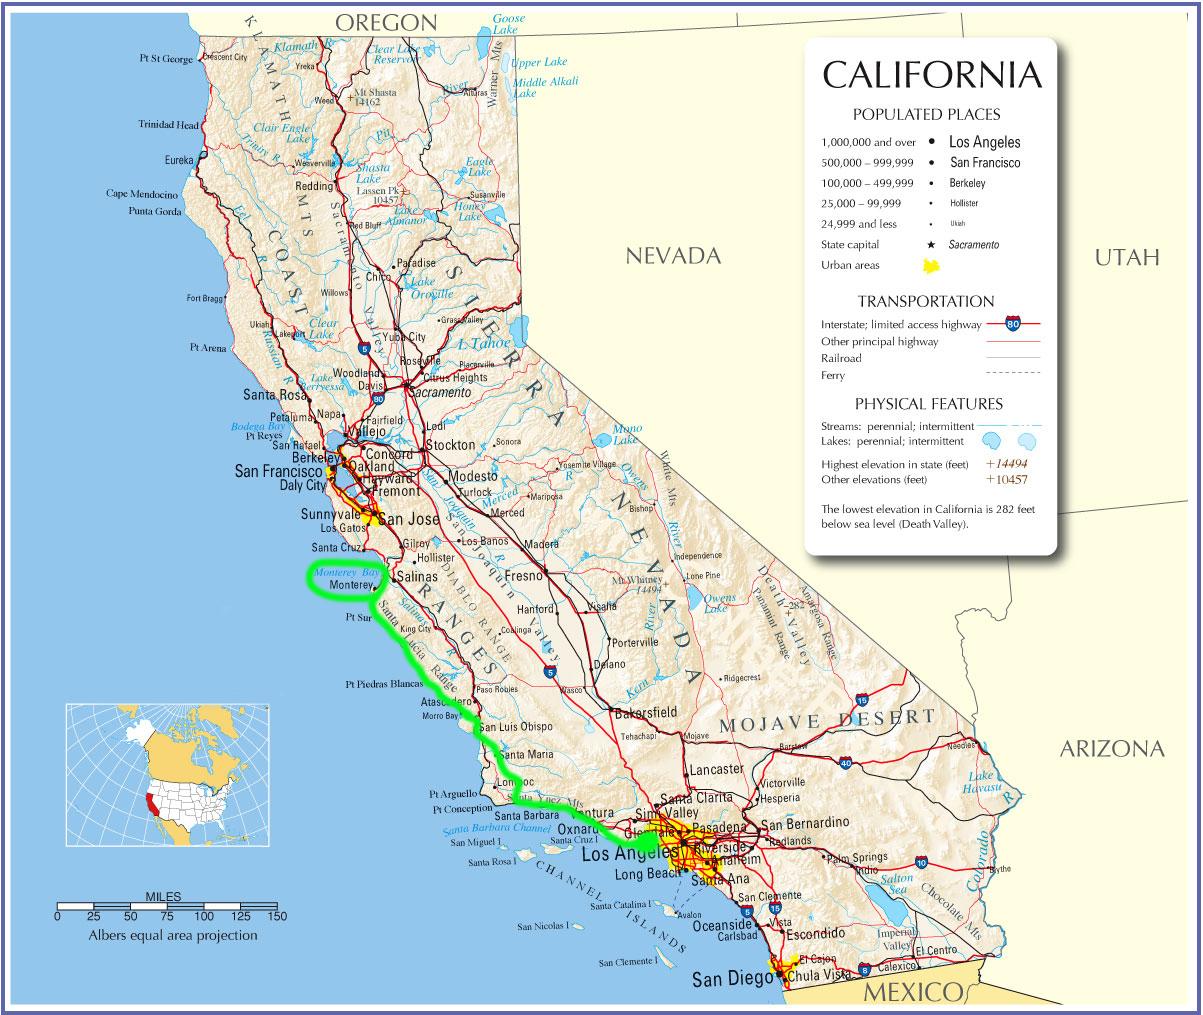 Map Of Highway 1 In California - Klipy - Route 1 California Map